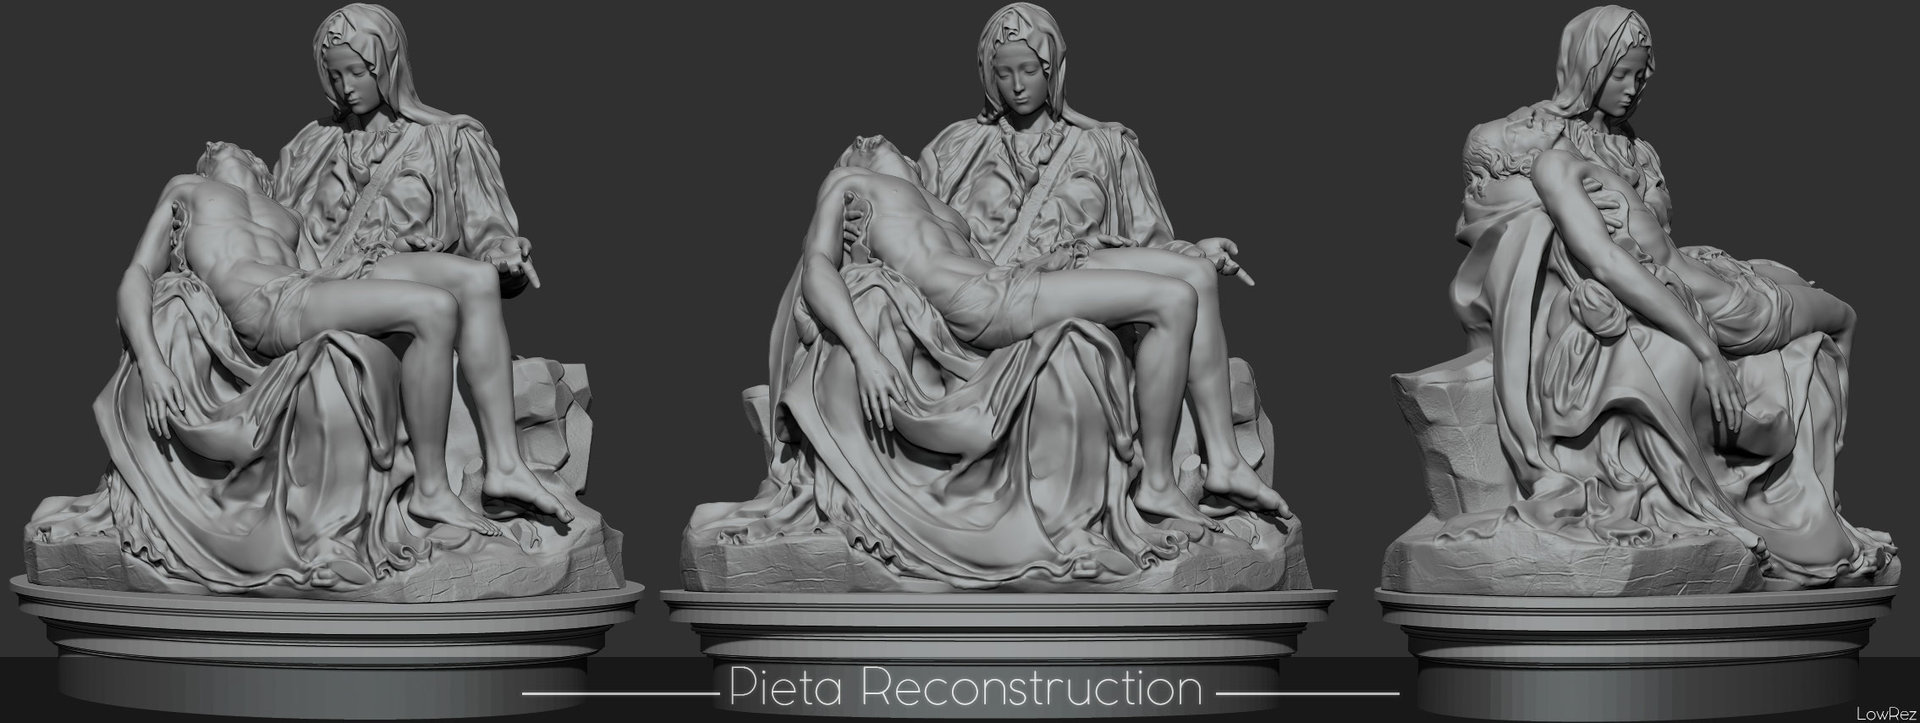 Reza sedghi sculptrenders1